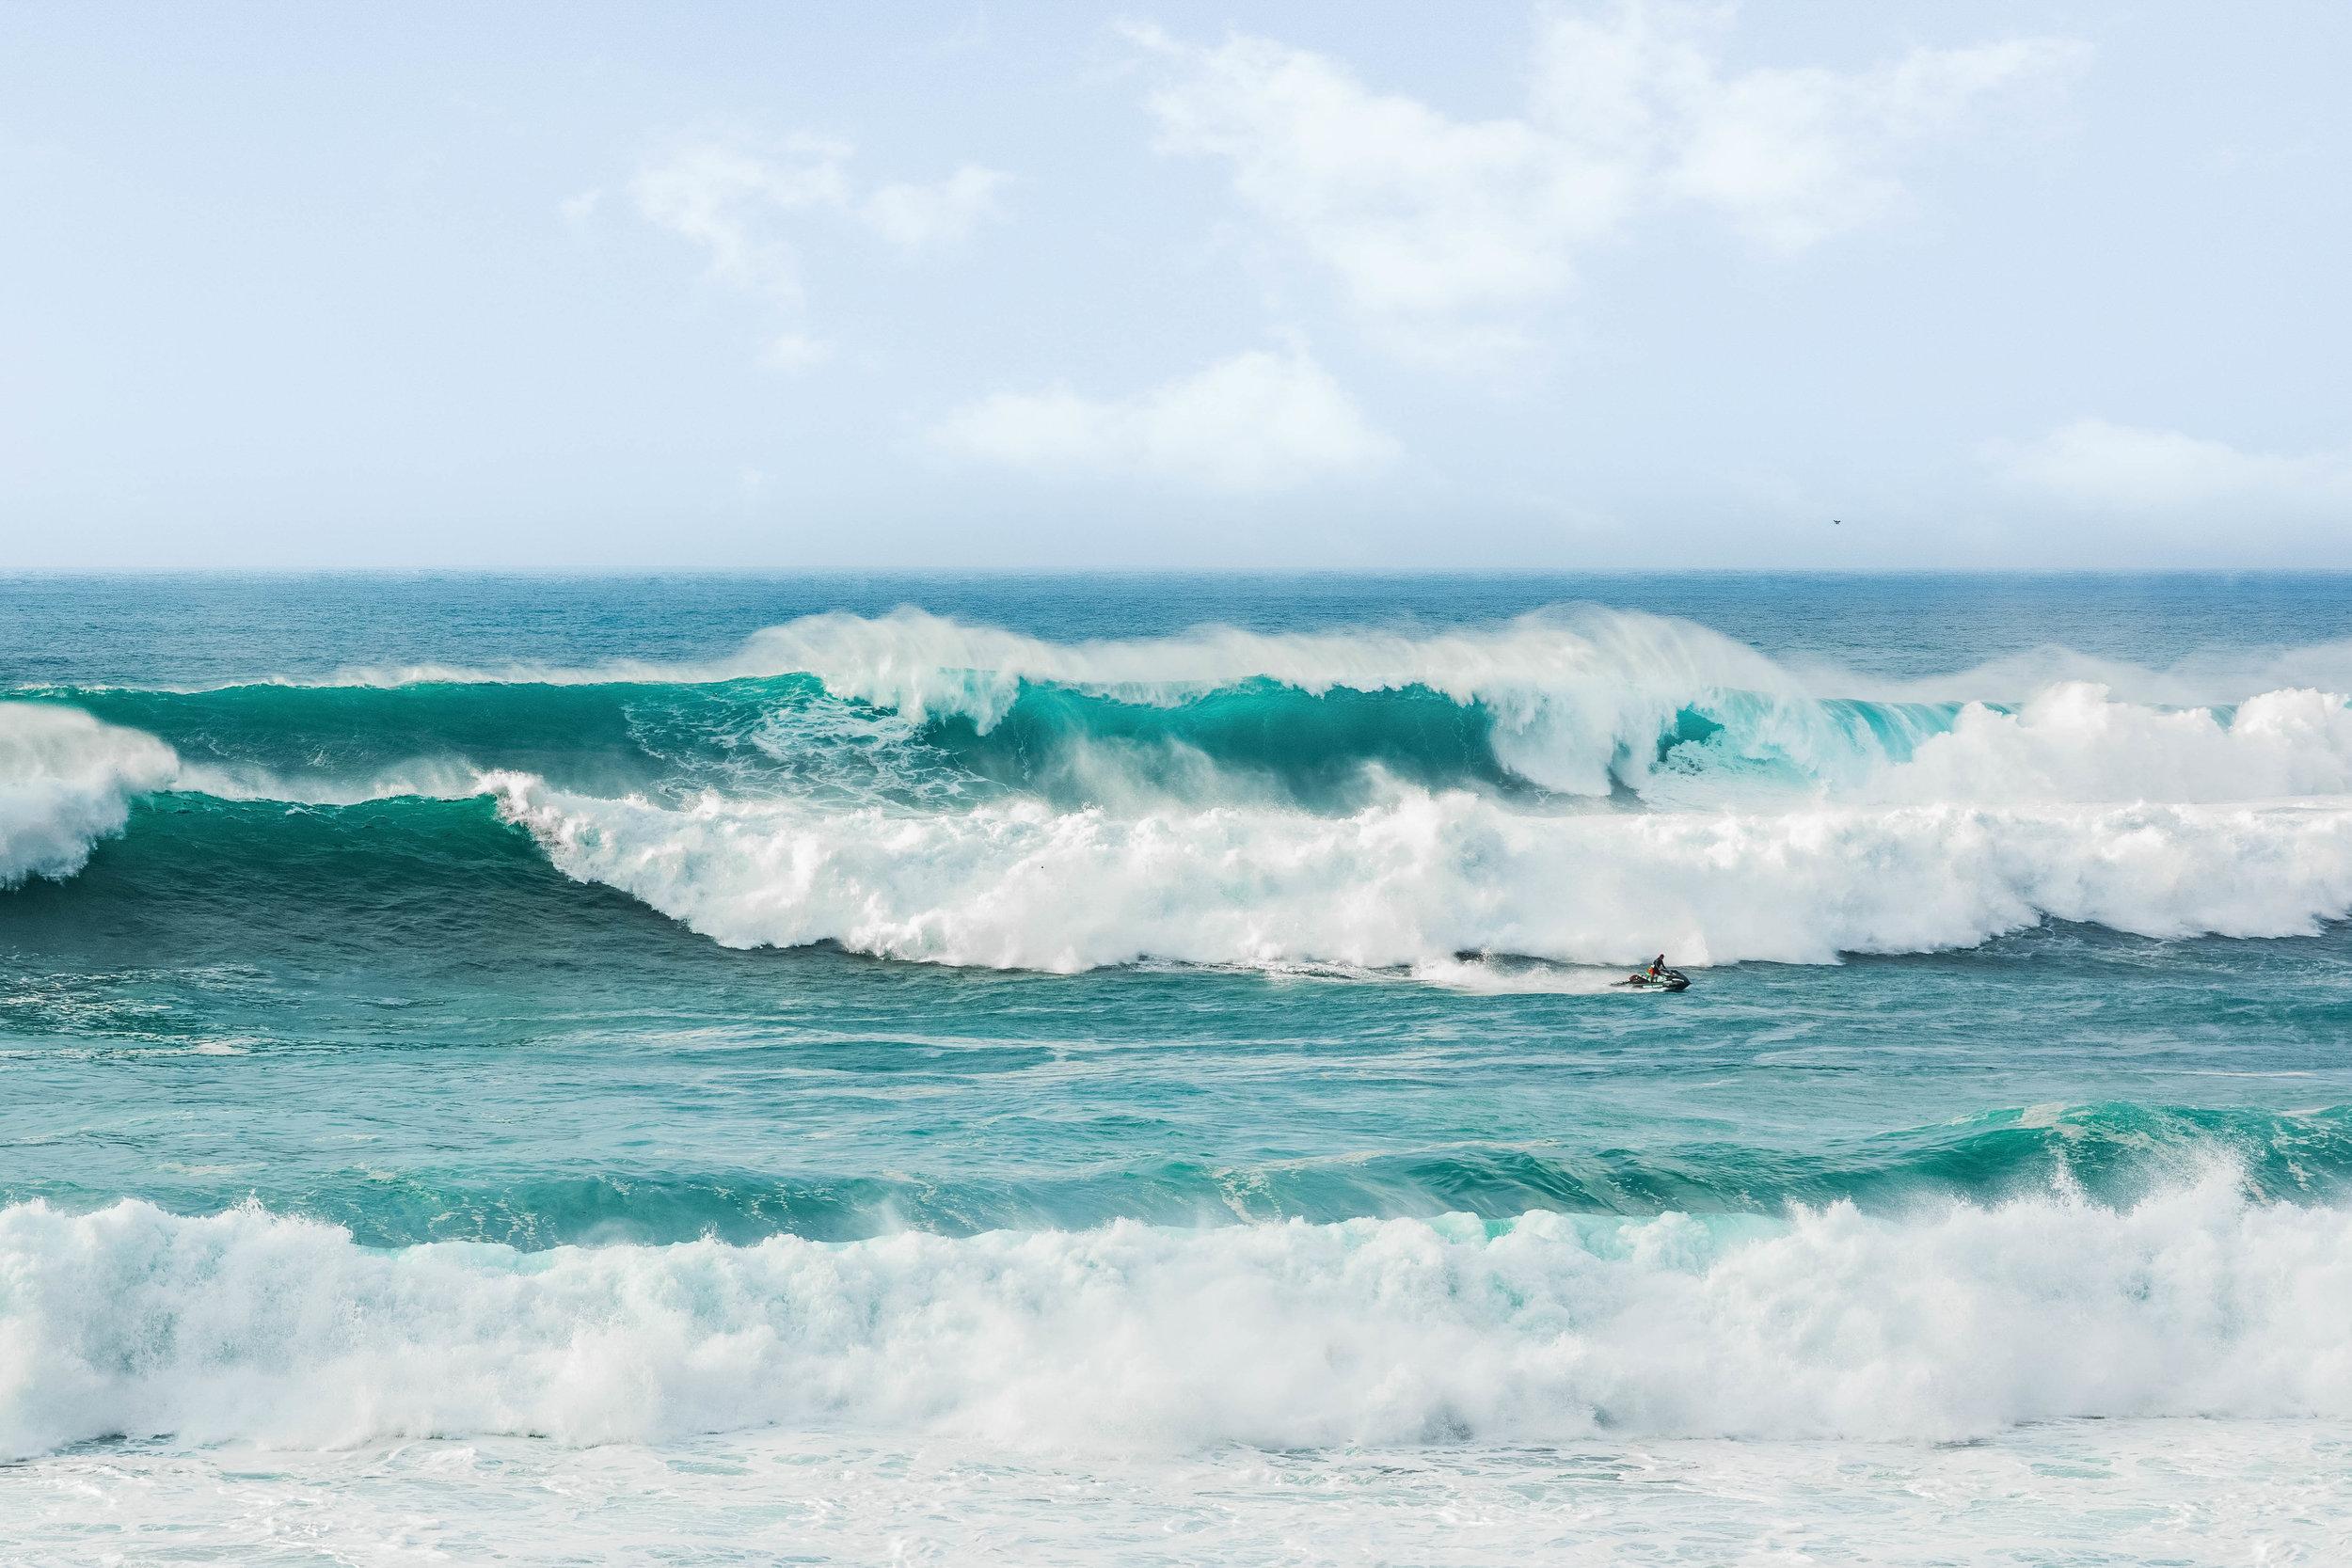 Waimea Bay, Oahu's North Shore, - Big Wave Day, 2016